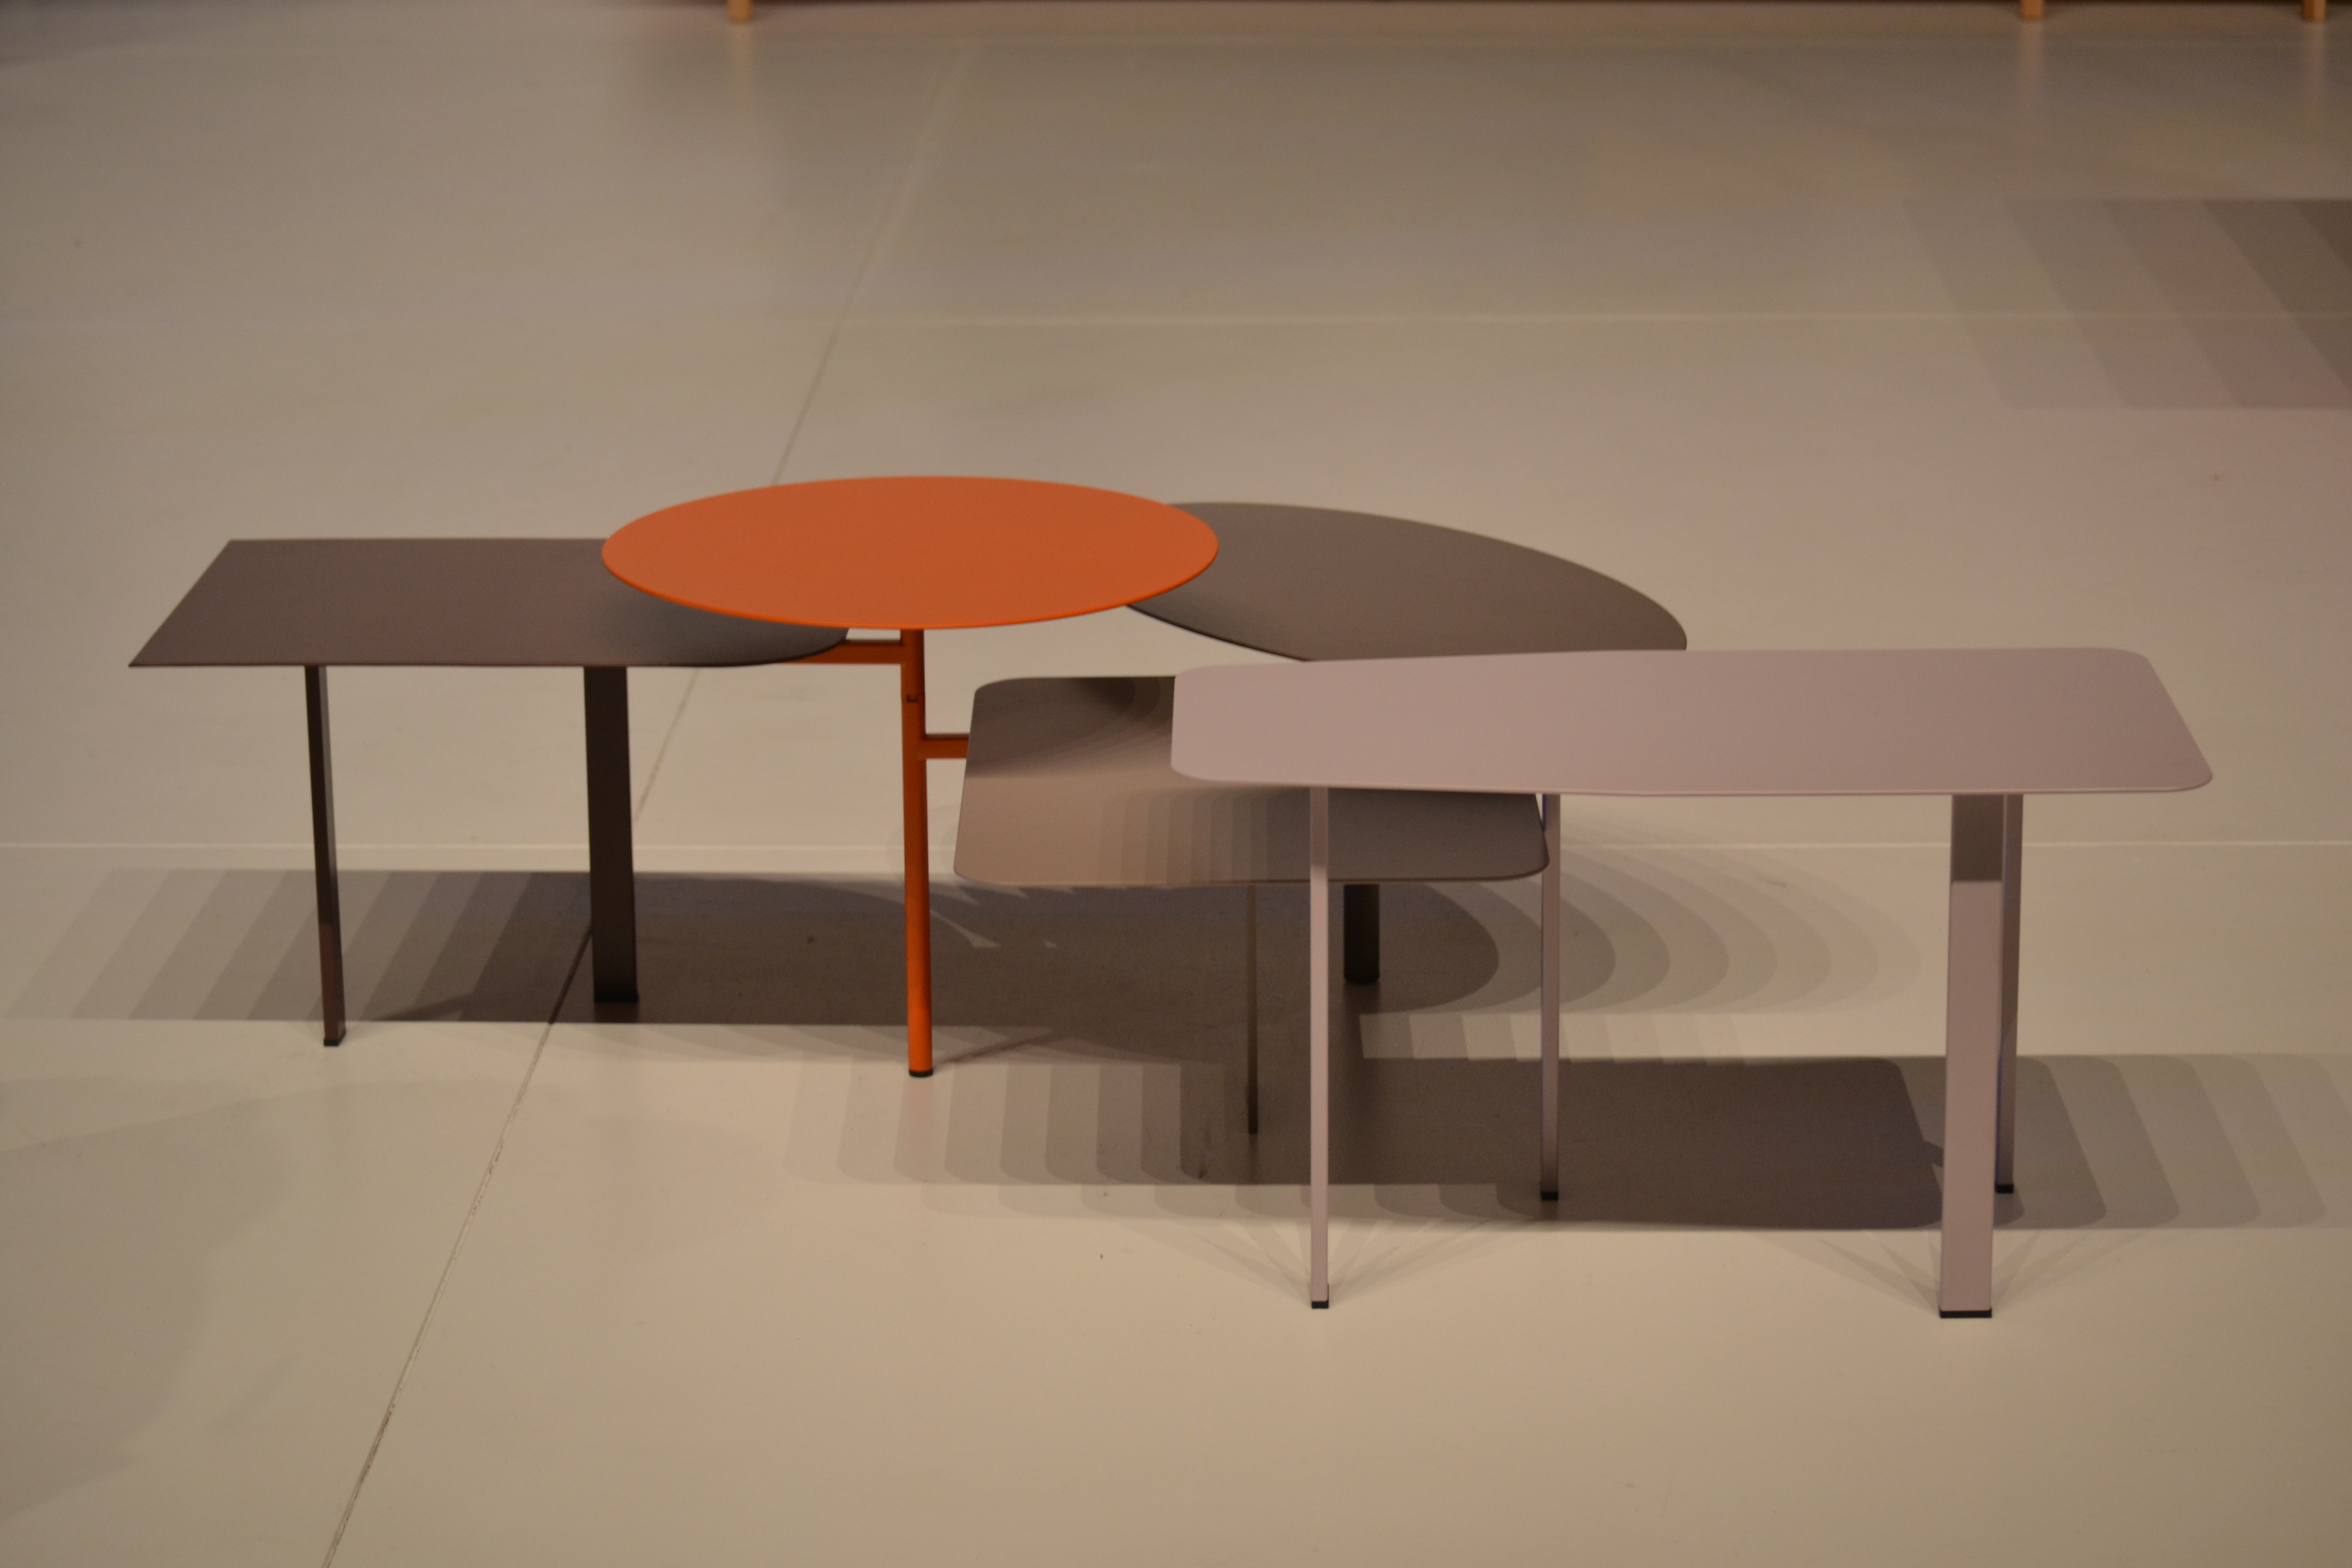 Biennale interieur 2012 for Biennale interieur